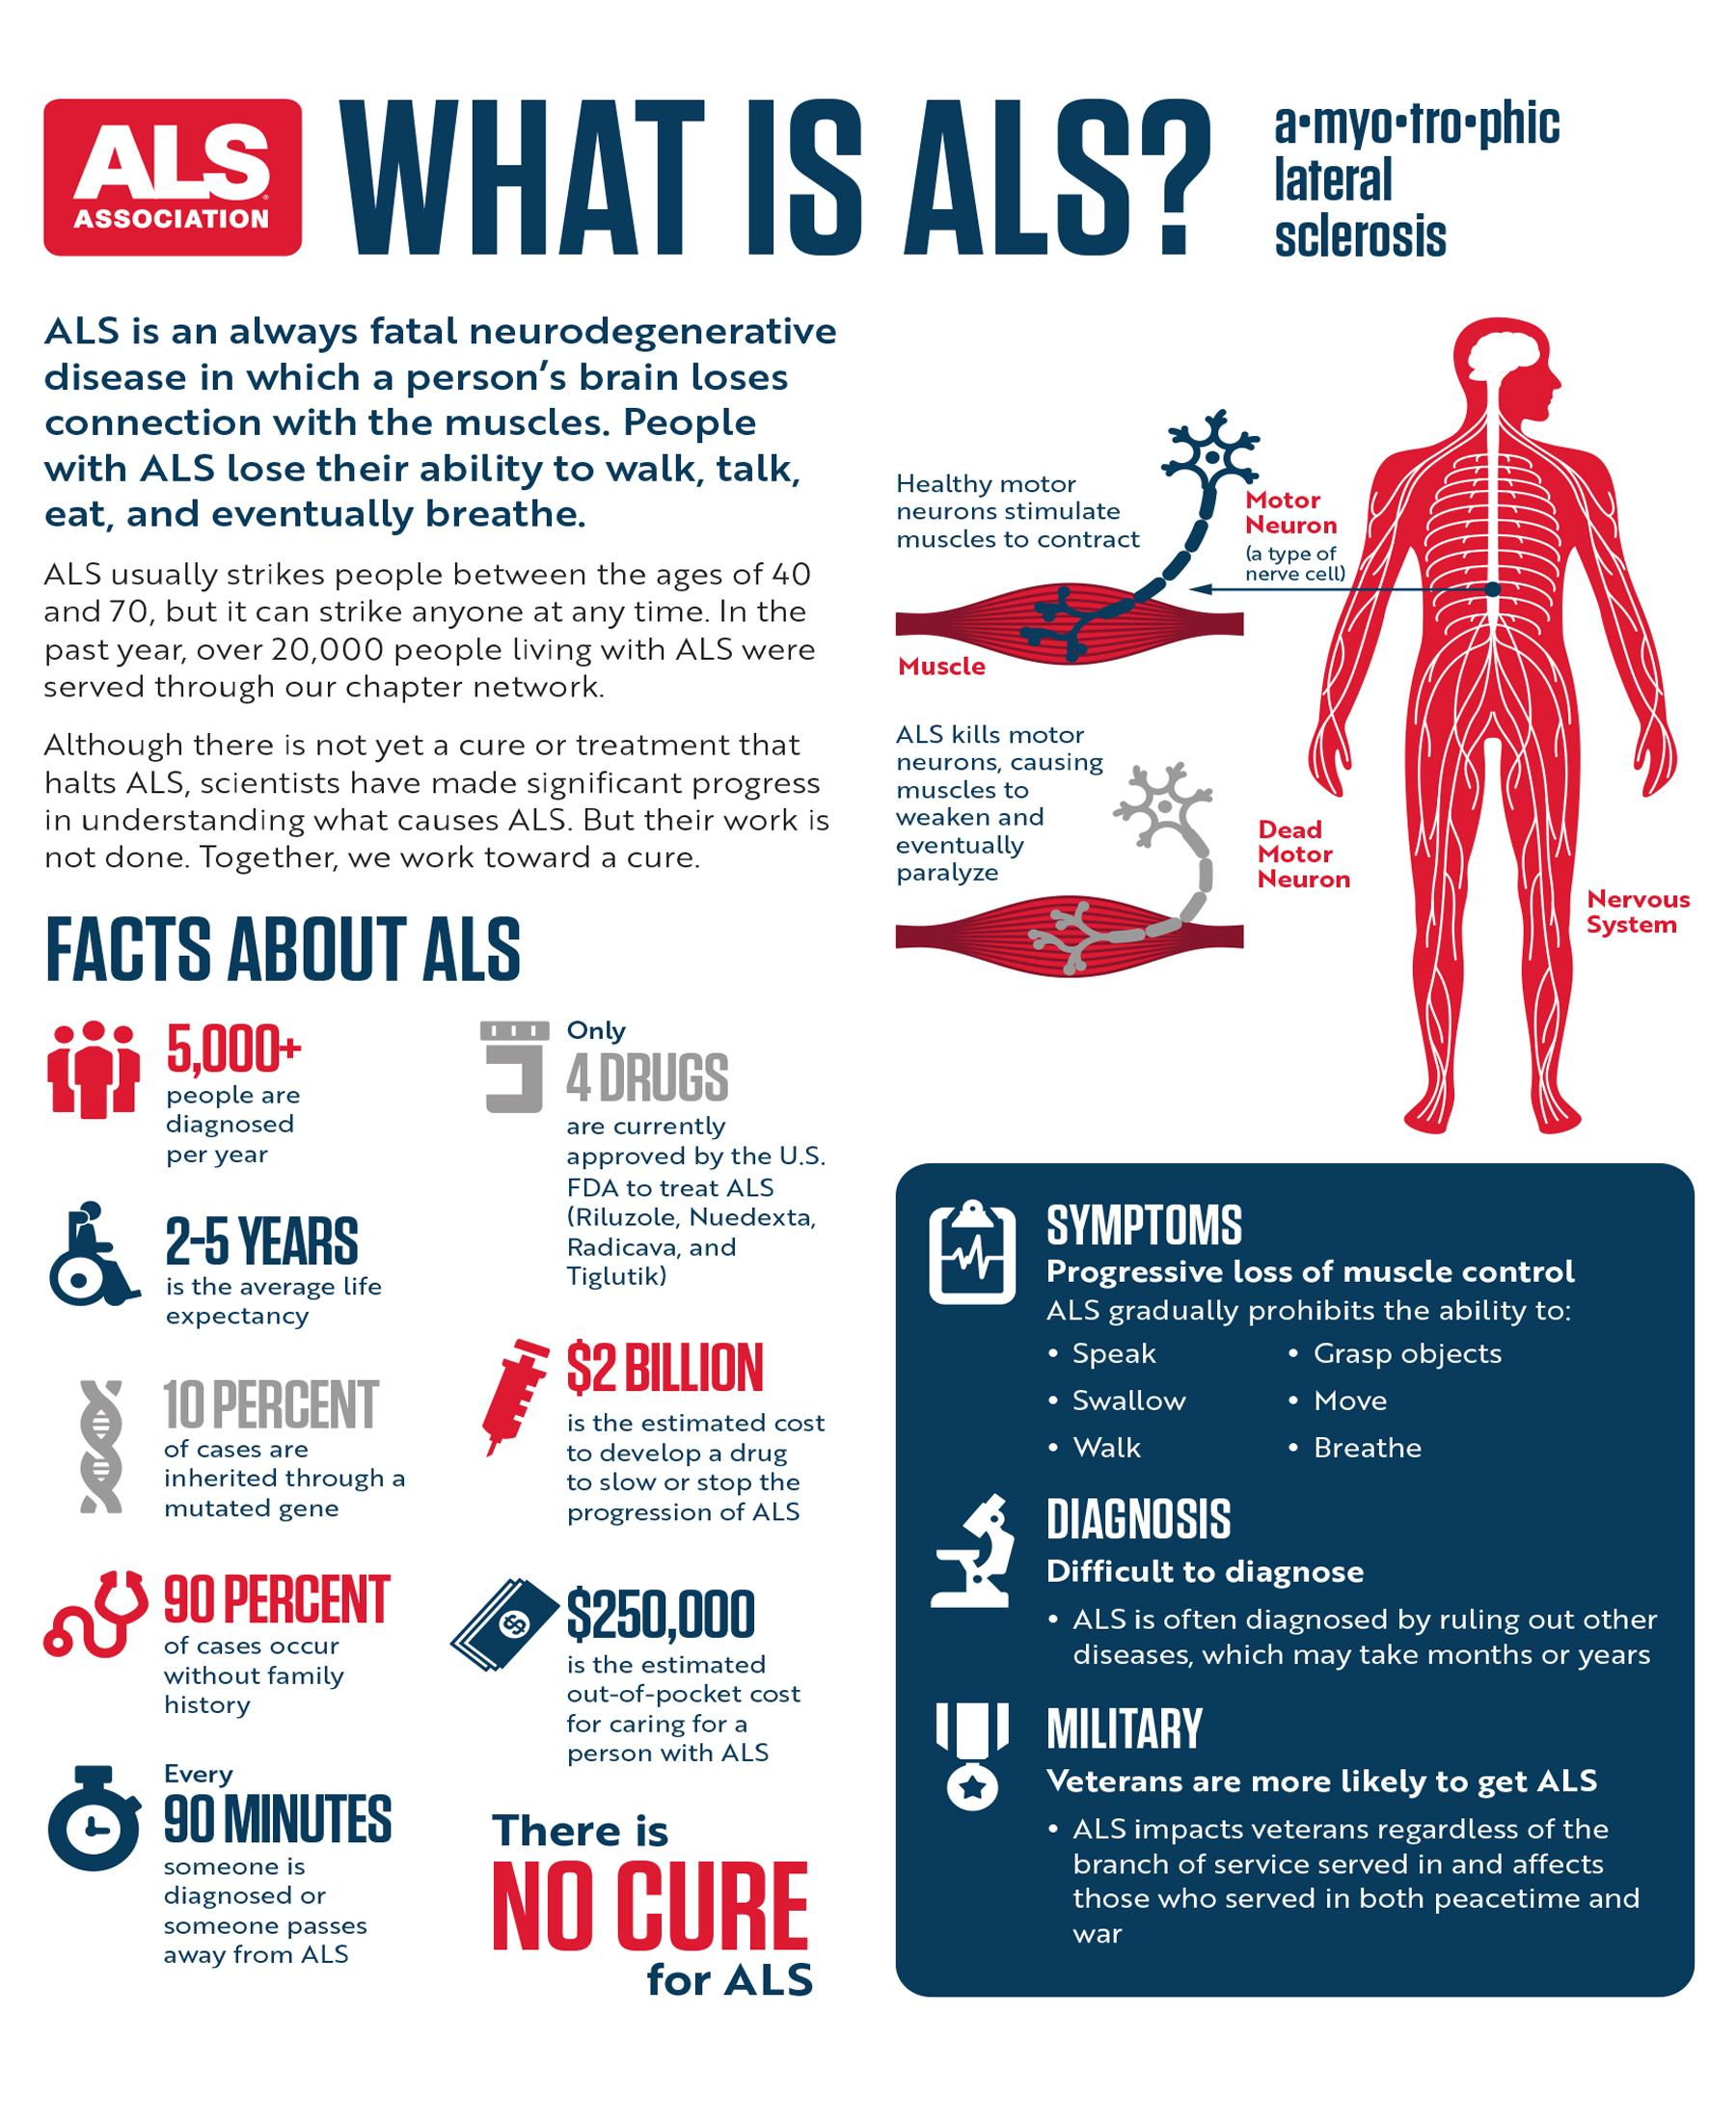 What Is ALS The ALS Association